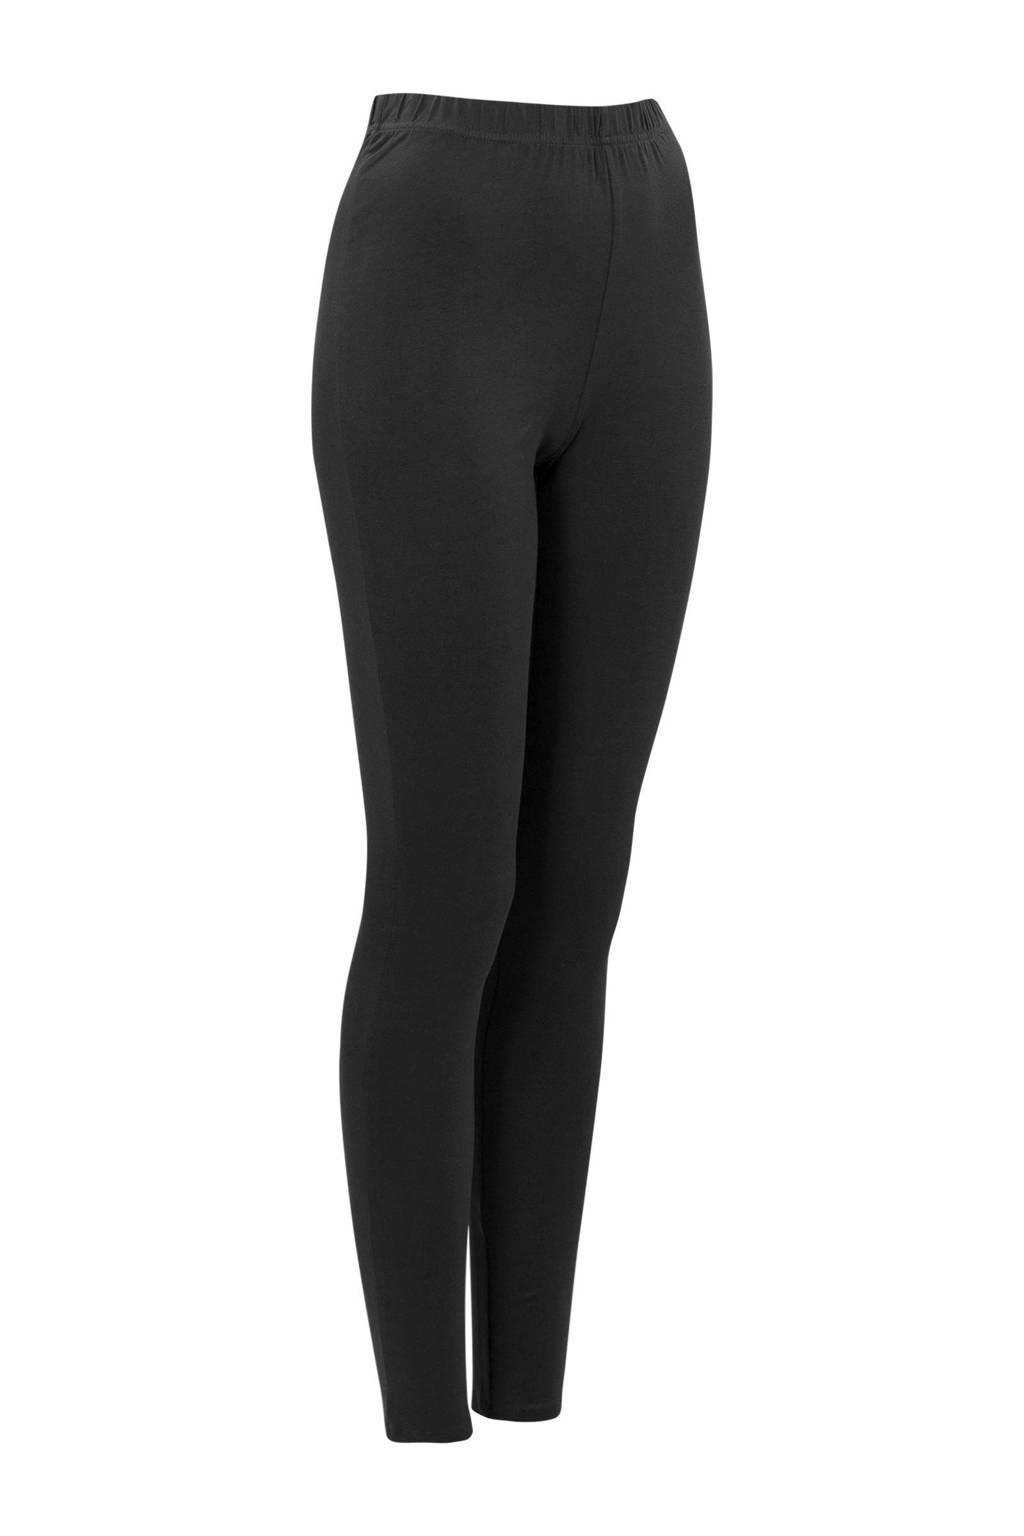 Miss Etam Lang legging zwart 36 inch, Zwart